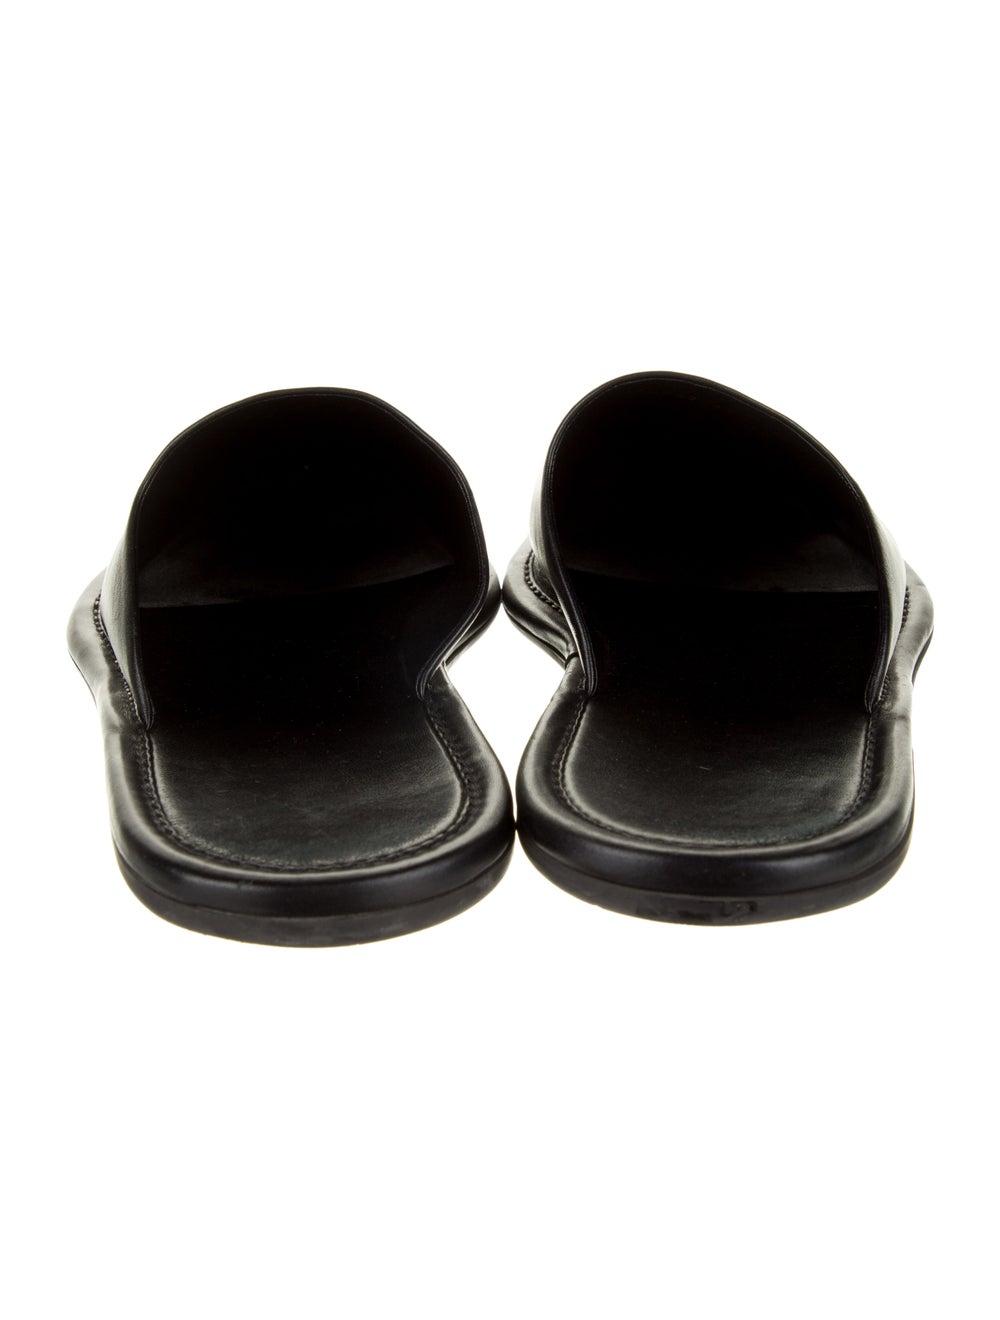 Balenciaga Carrera Mule Leather Slippers Black - image 4